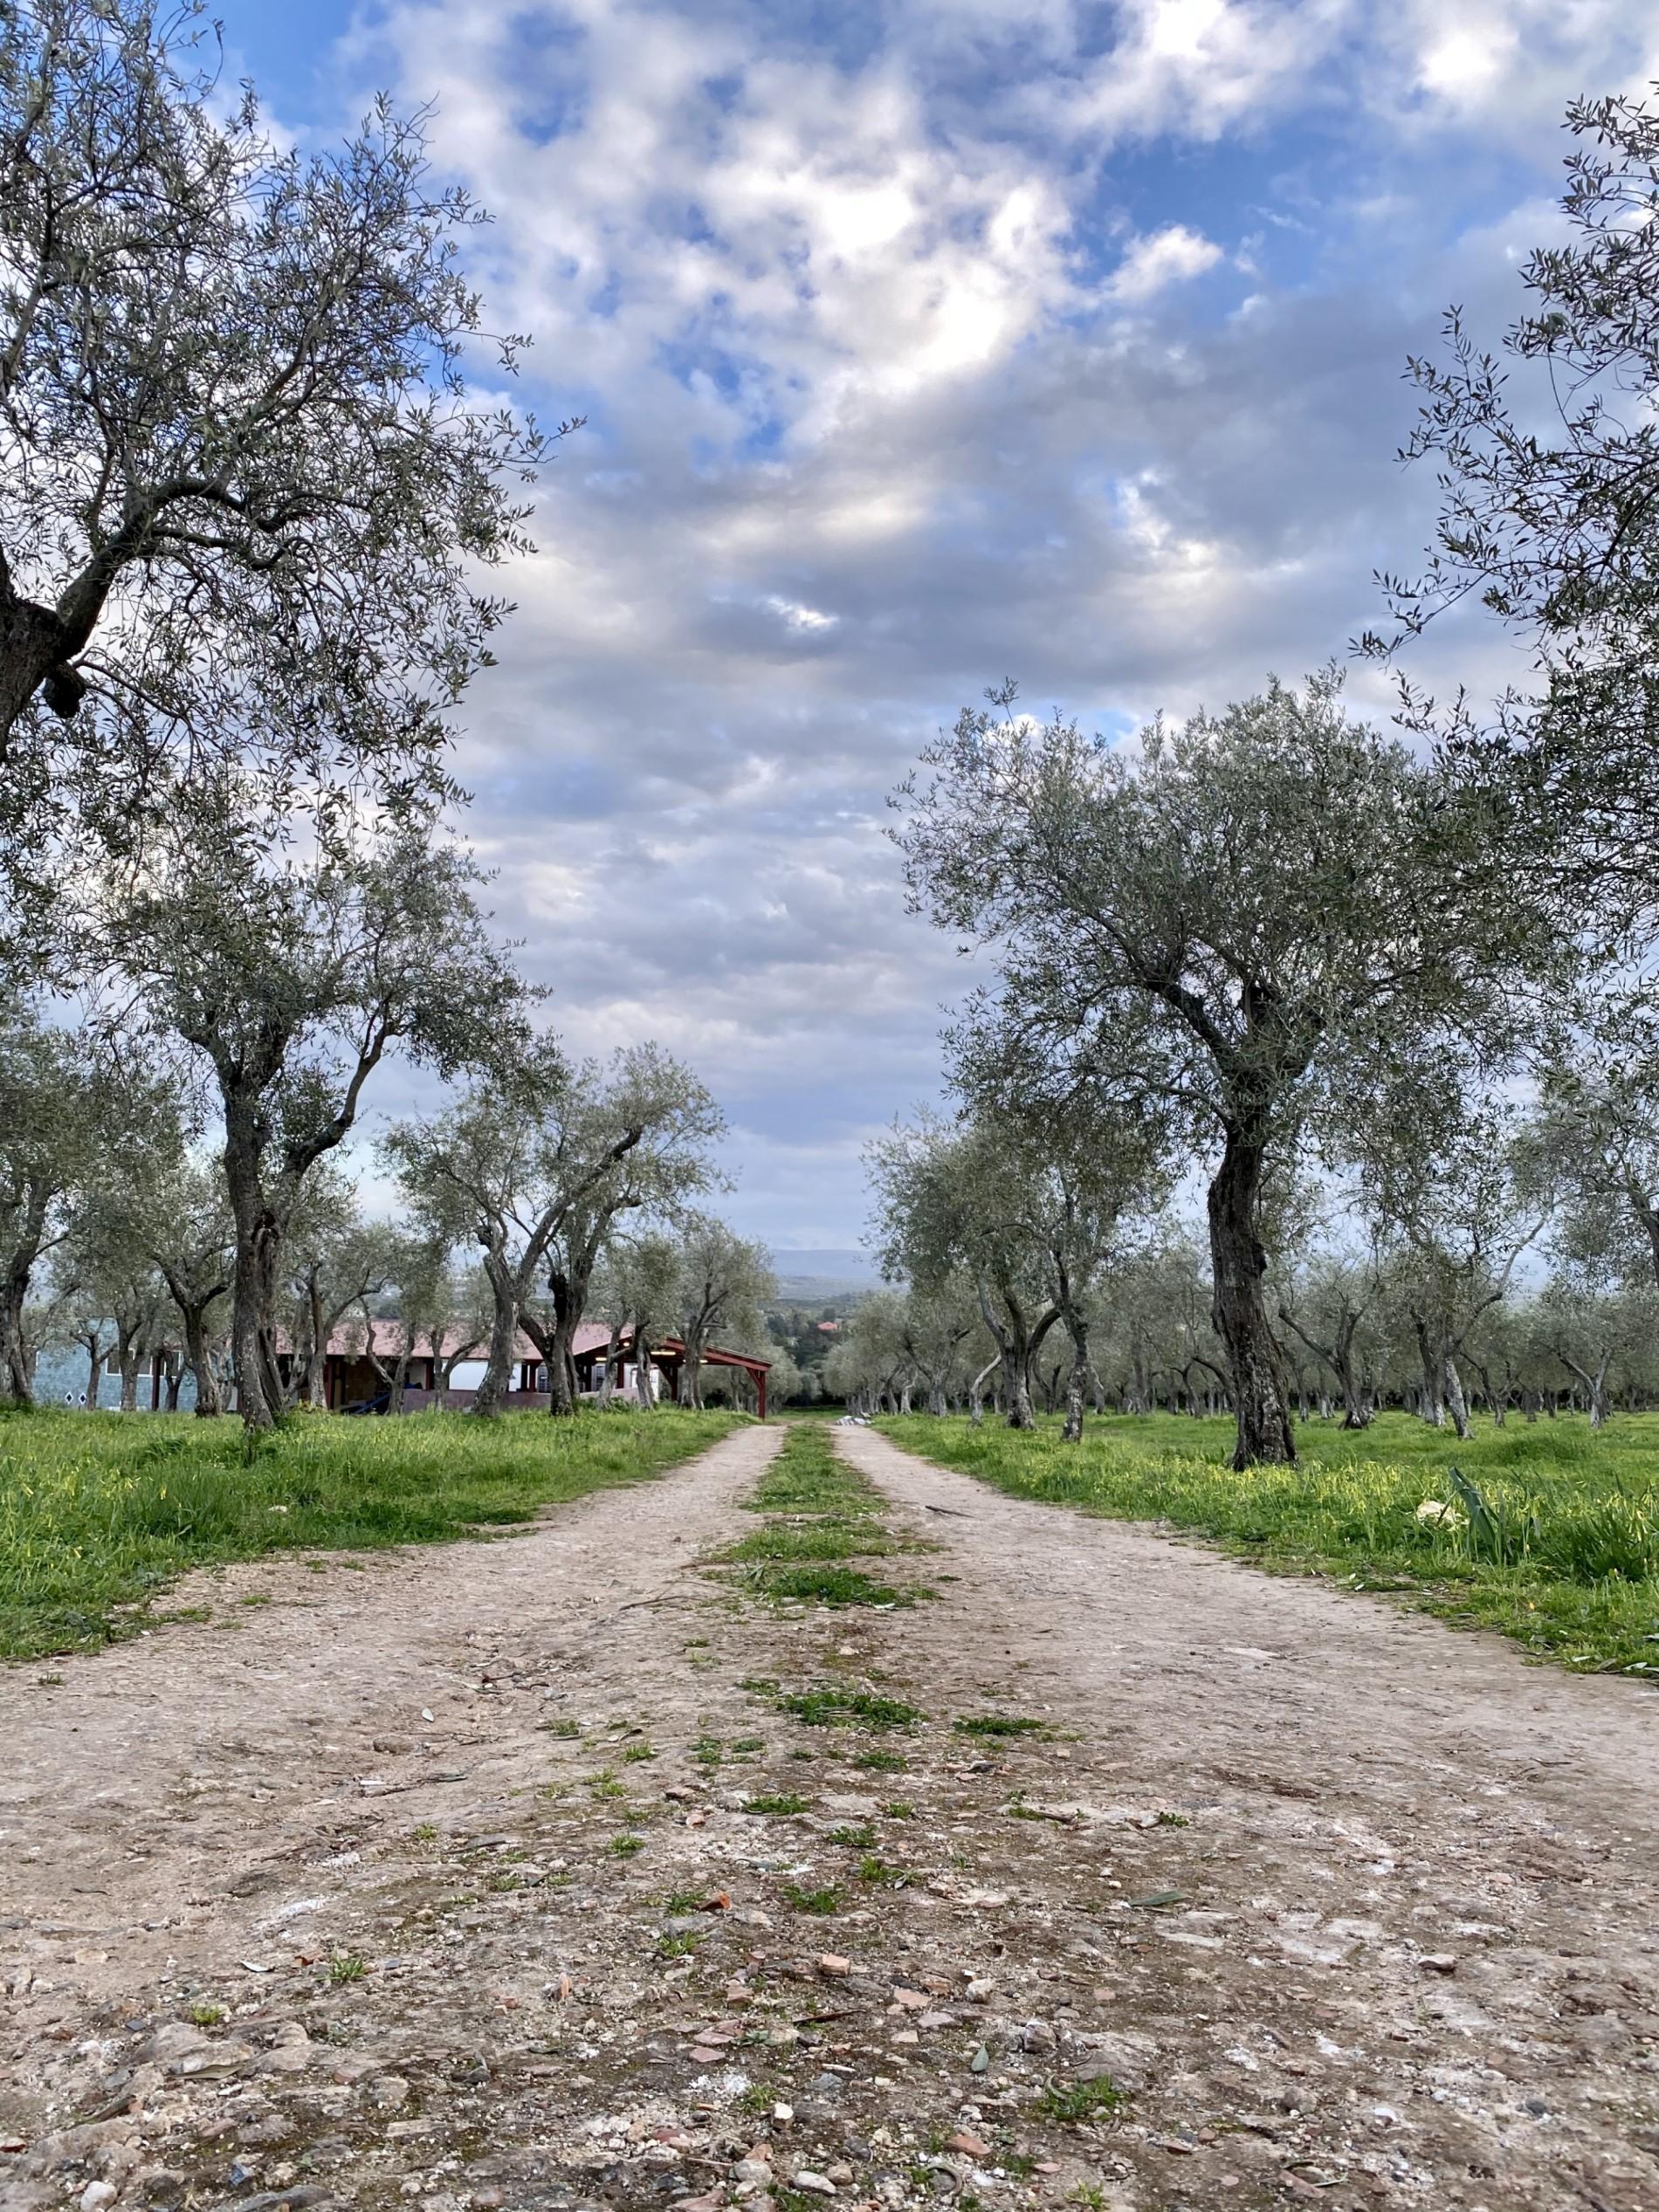 Sardegna extra virgin olive oil